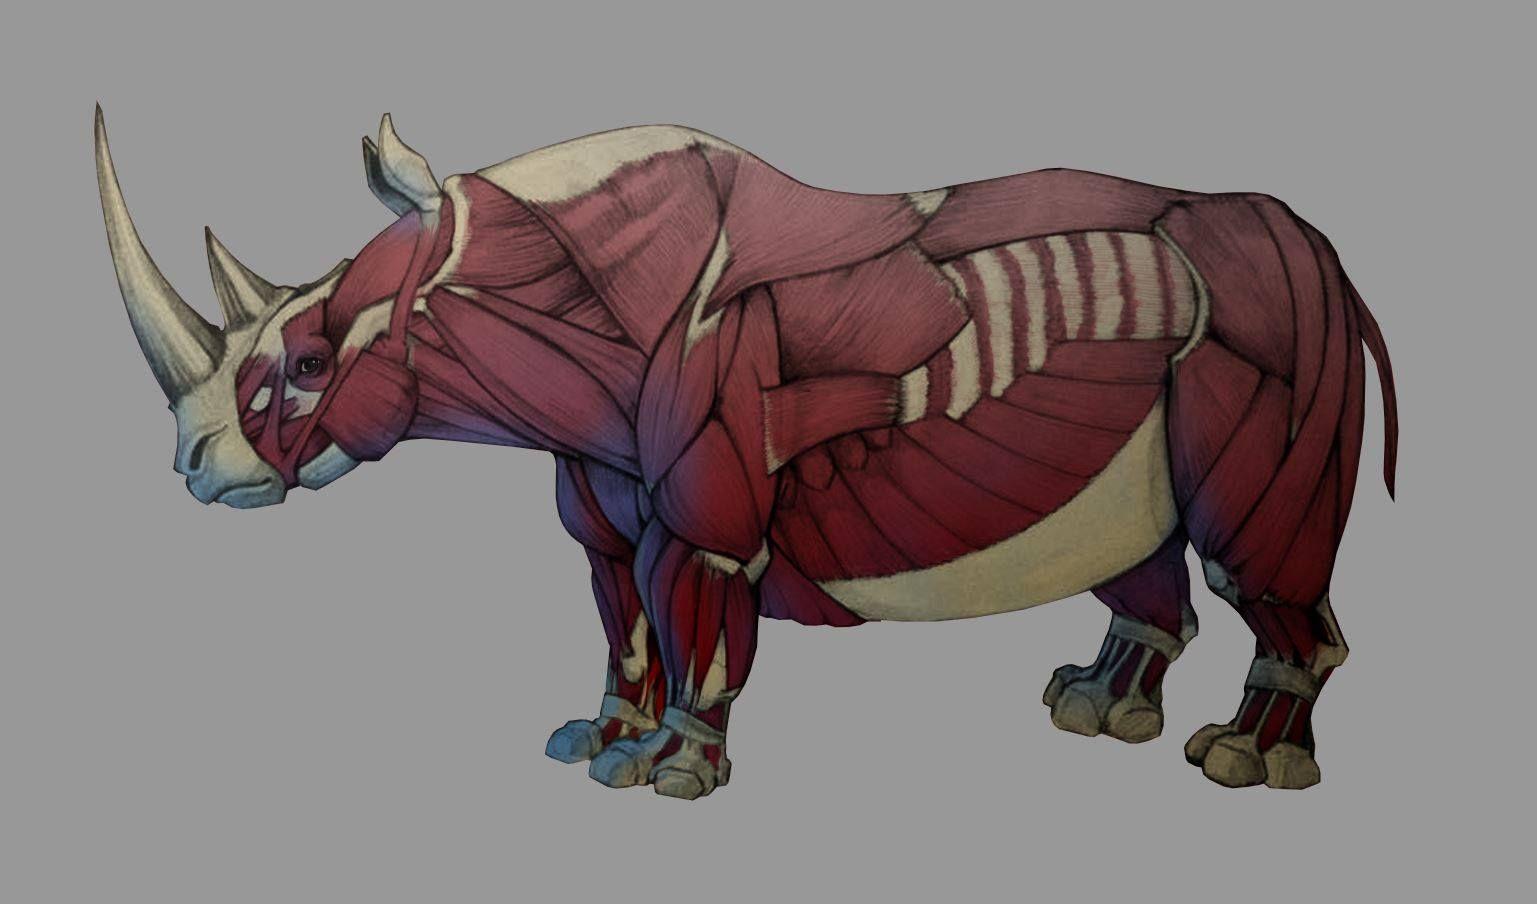 Rhino Anatomy Study | Animal drawings, Animals artwork ...